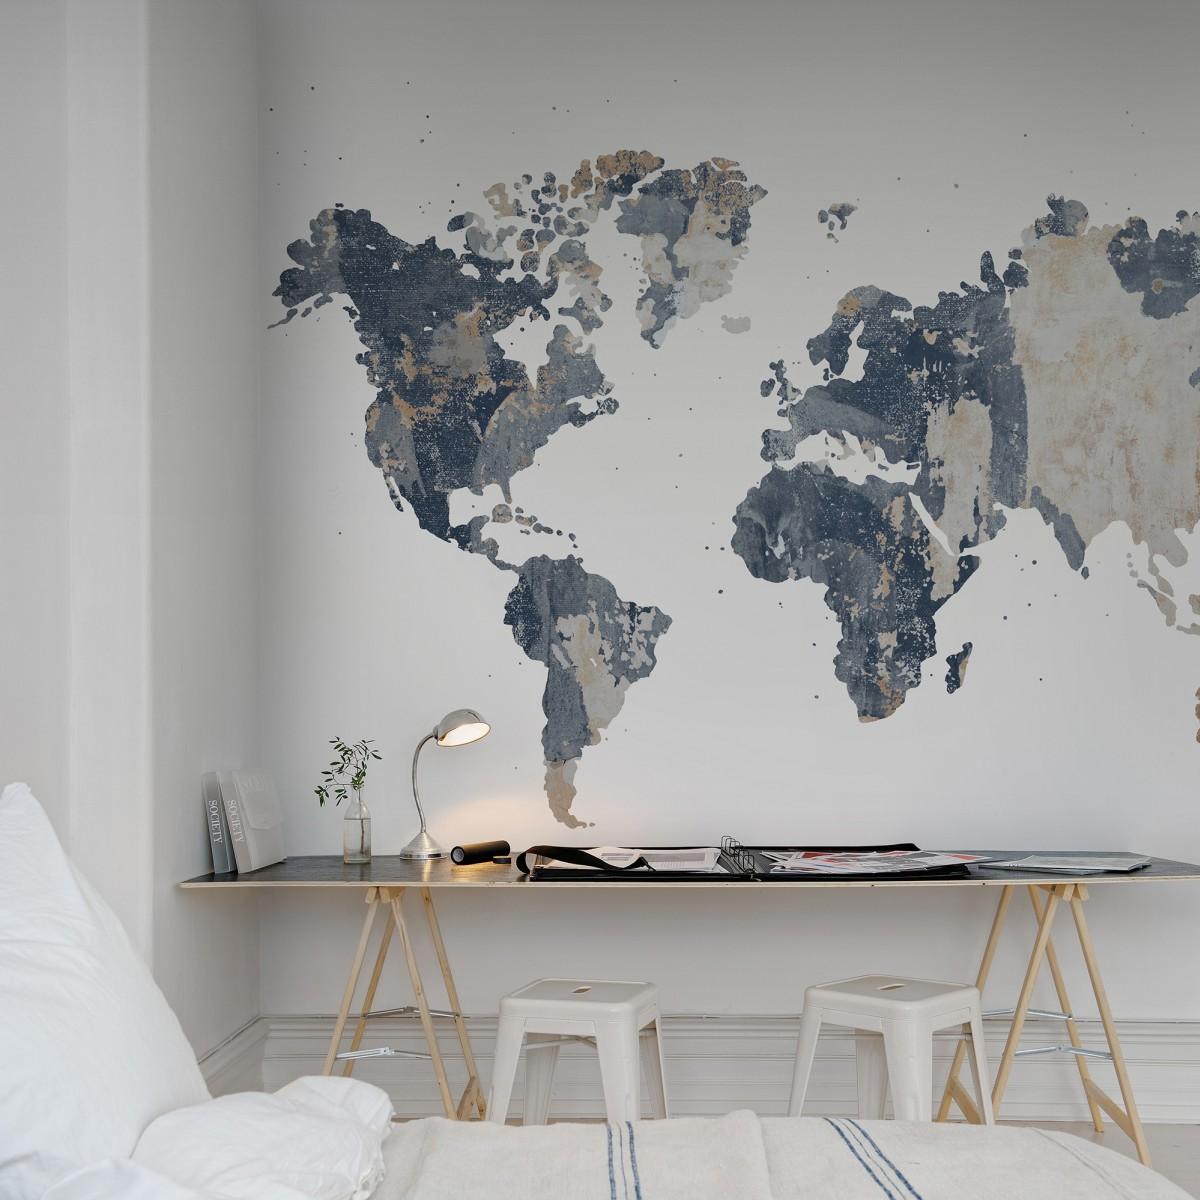 Fototapet Your Own World - Battered Wall, personalizat, Rebel Walls